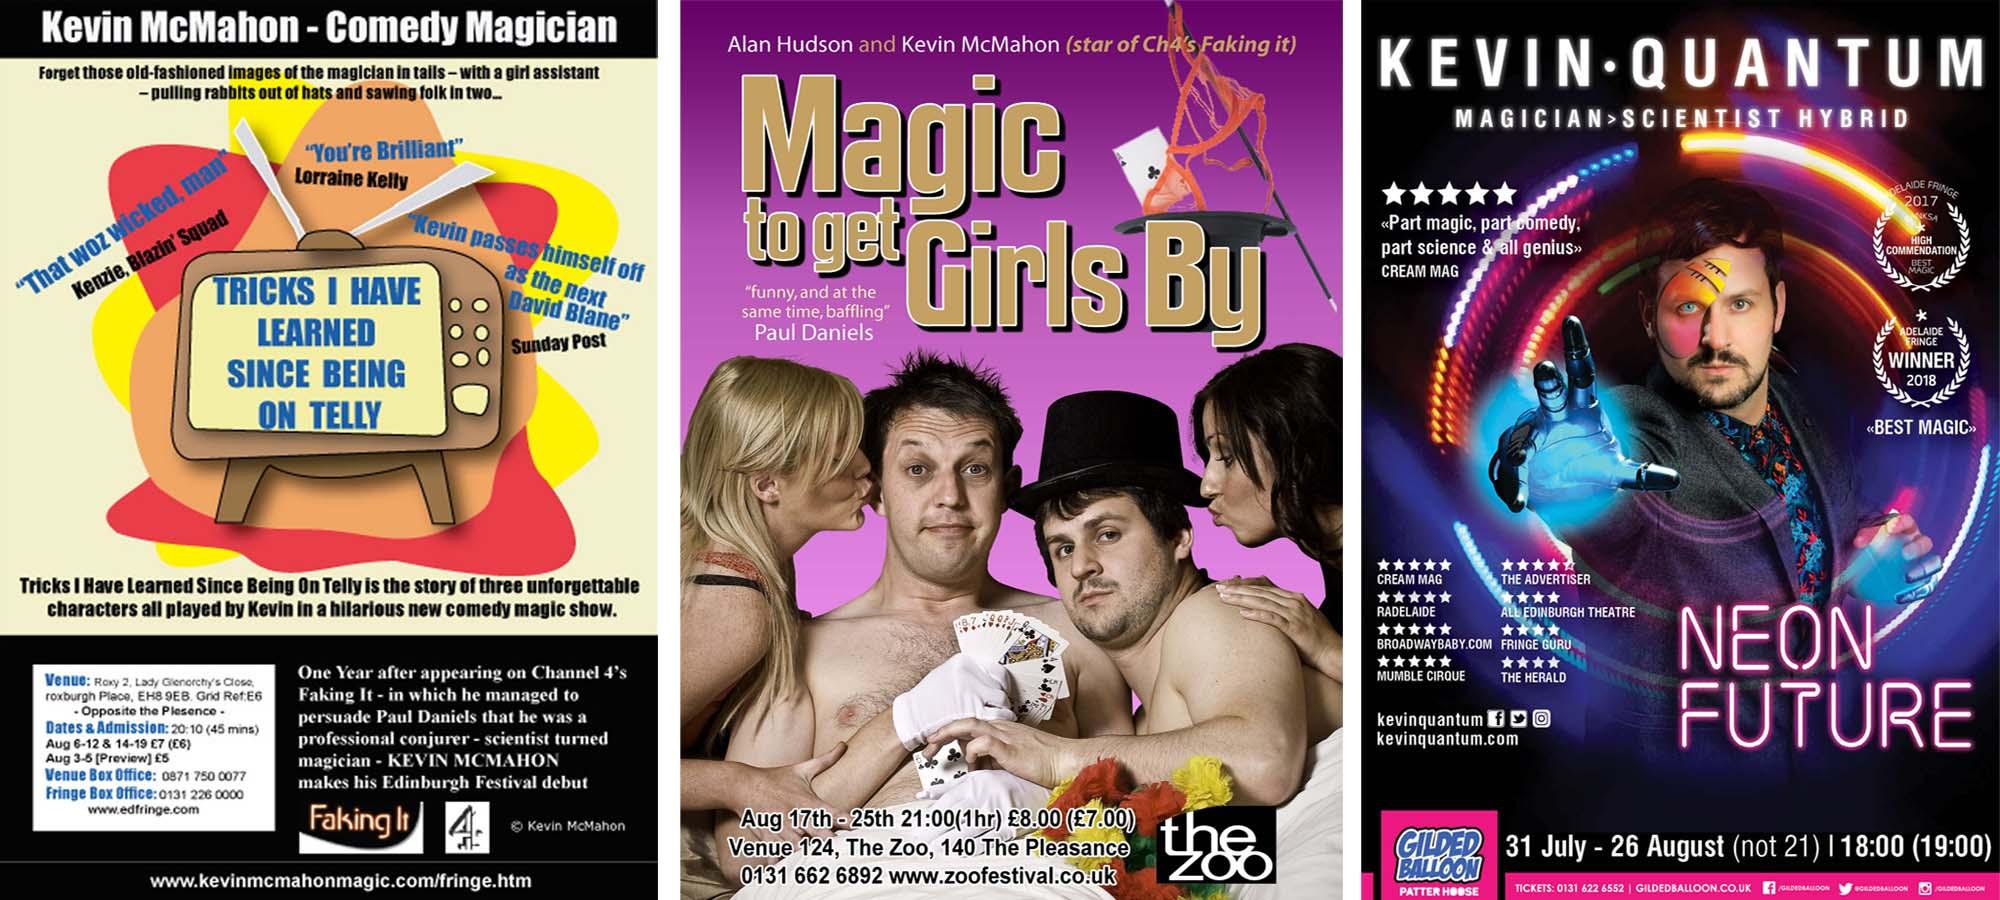 How to Write a Magic Show - Kevin Quantum Magician